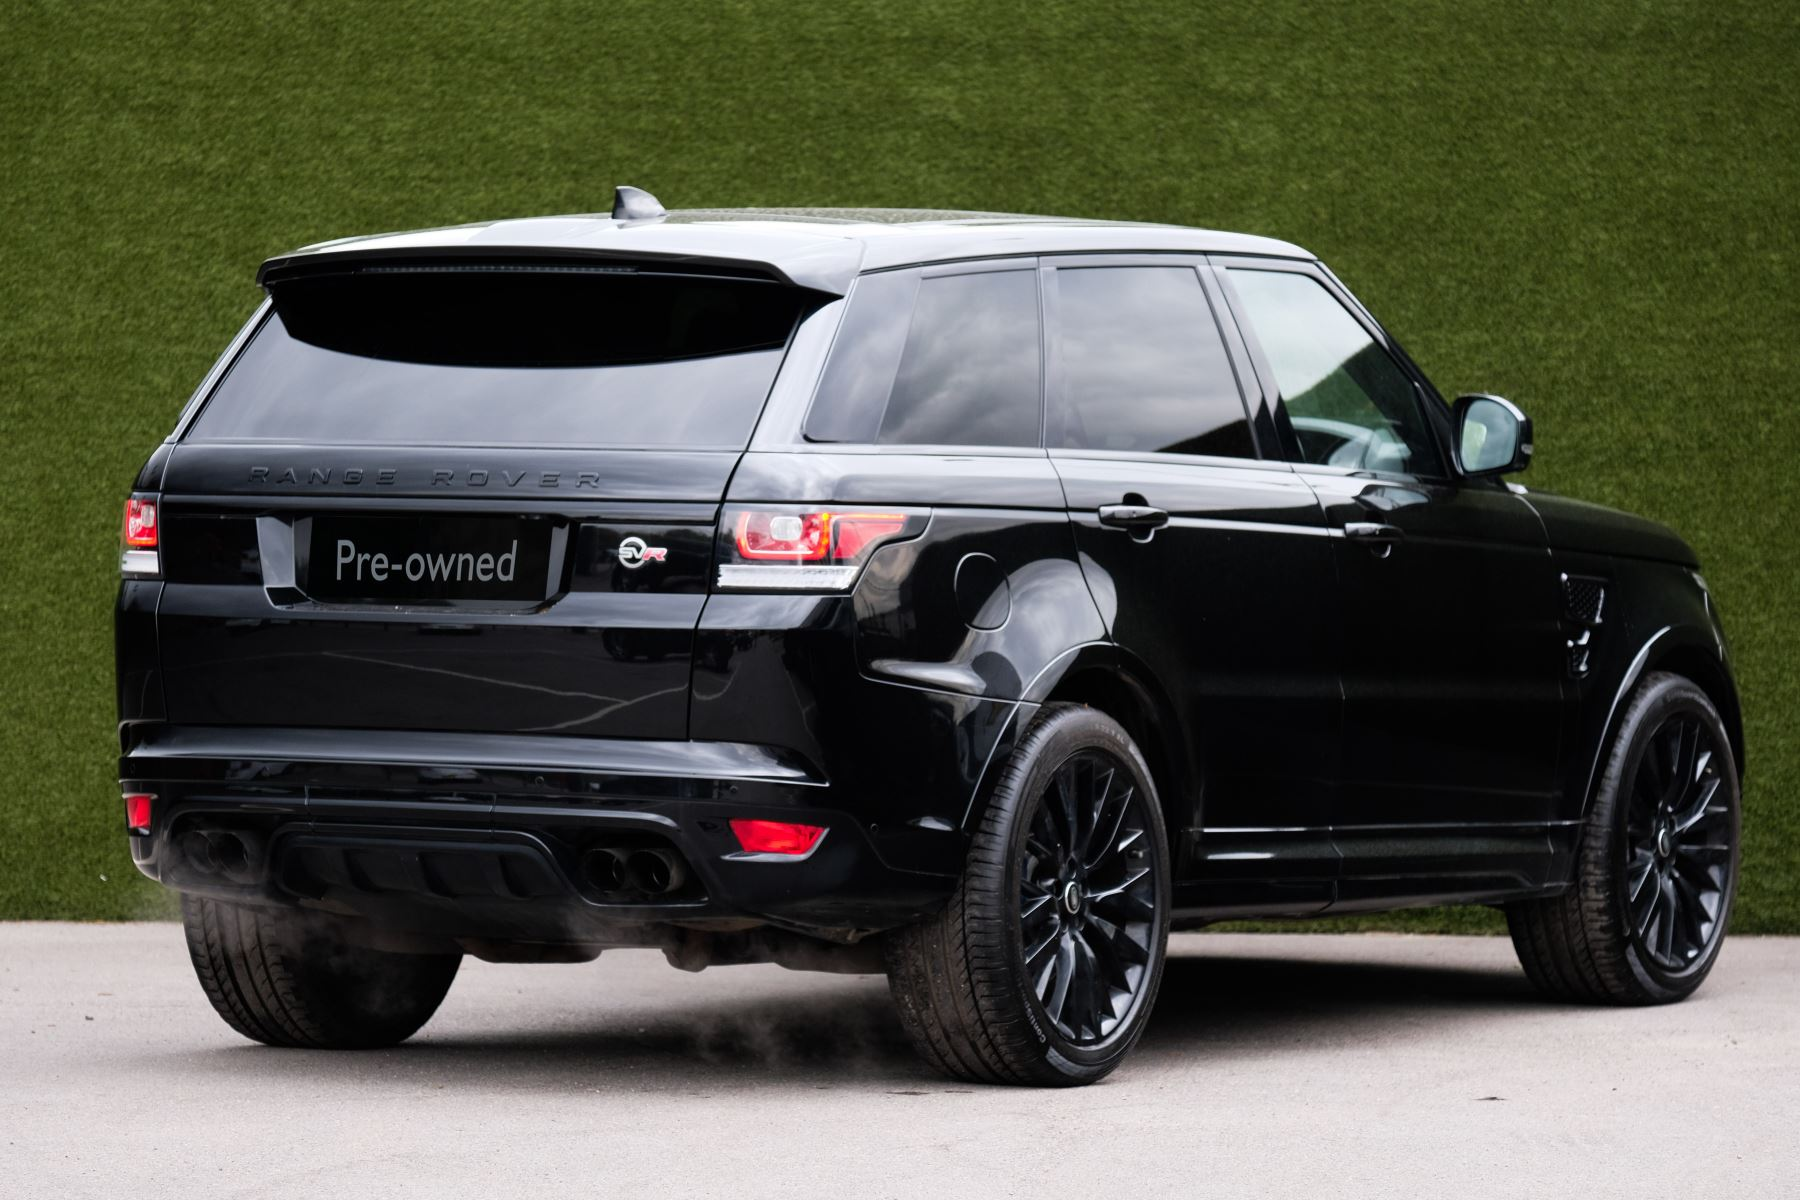 Land Rover Range Rover Sport 5.0 V8 S/C SVR 5dr image 6